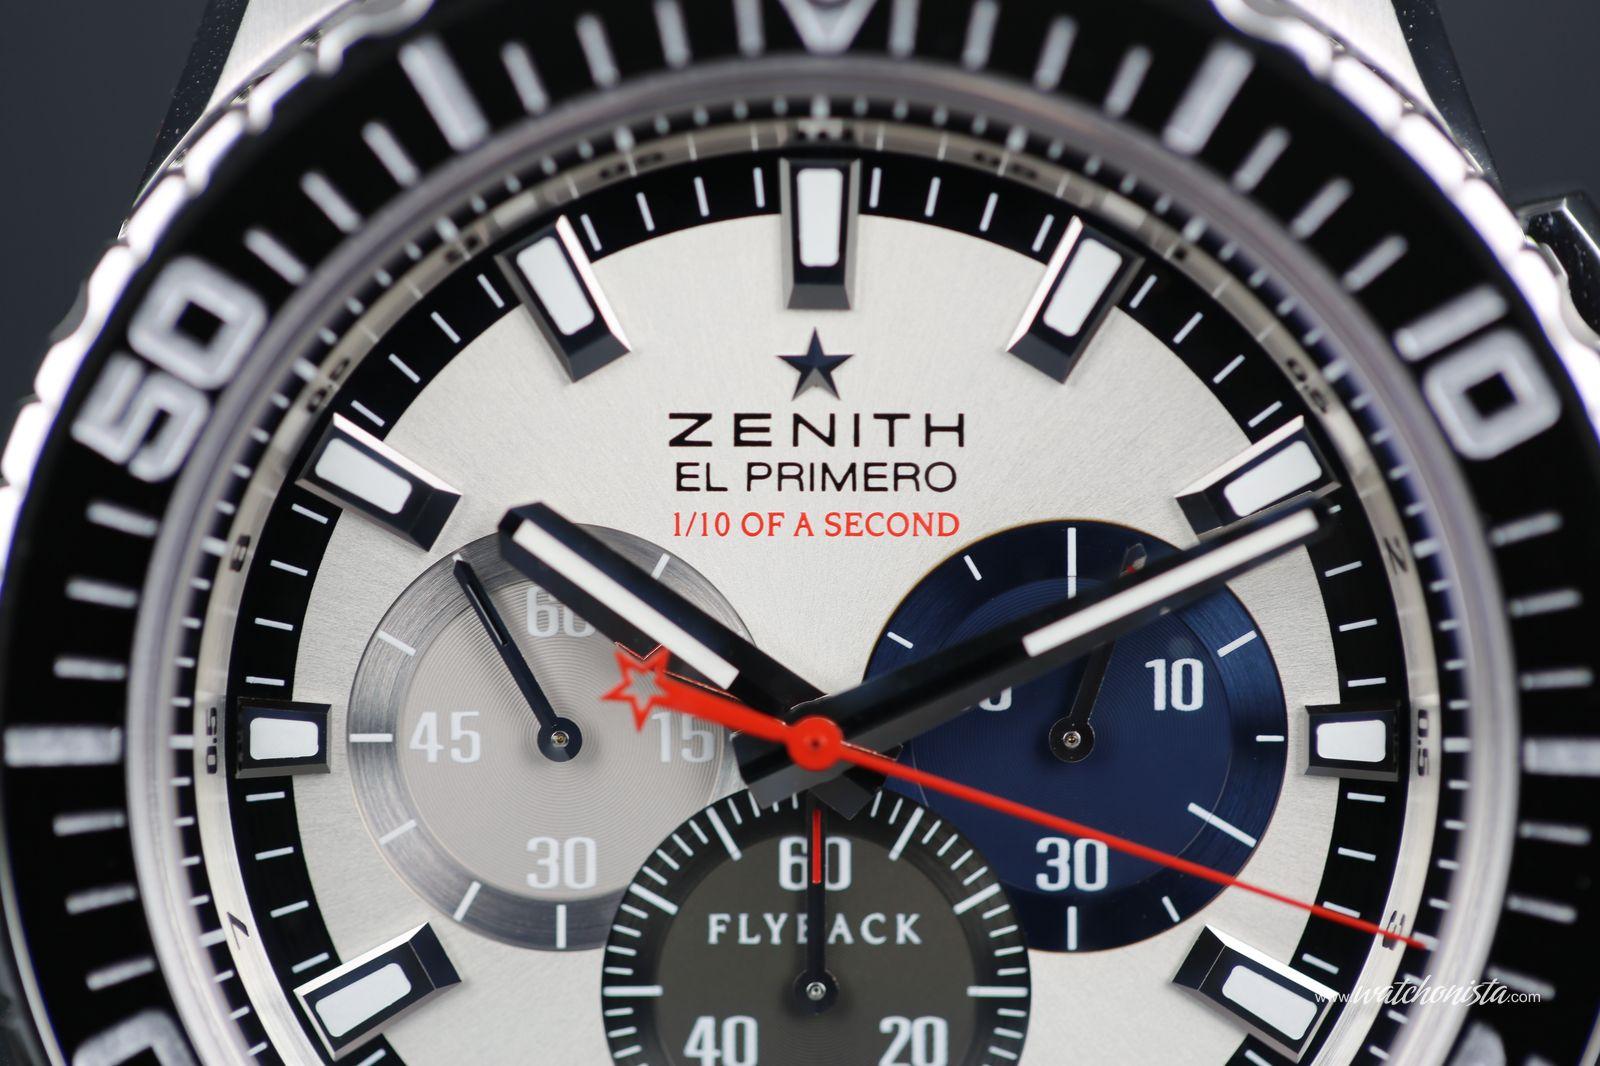 73e1b54810d The Zenith El Primero Stratos Flyback Striking 10TH Tribute to Felix  Baumgartner unique prototype